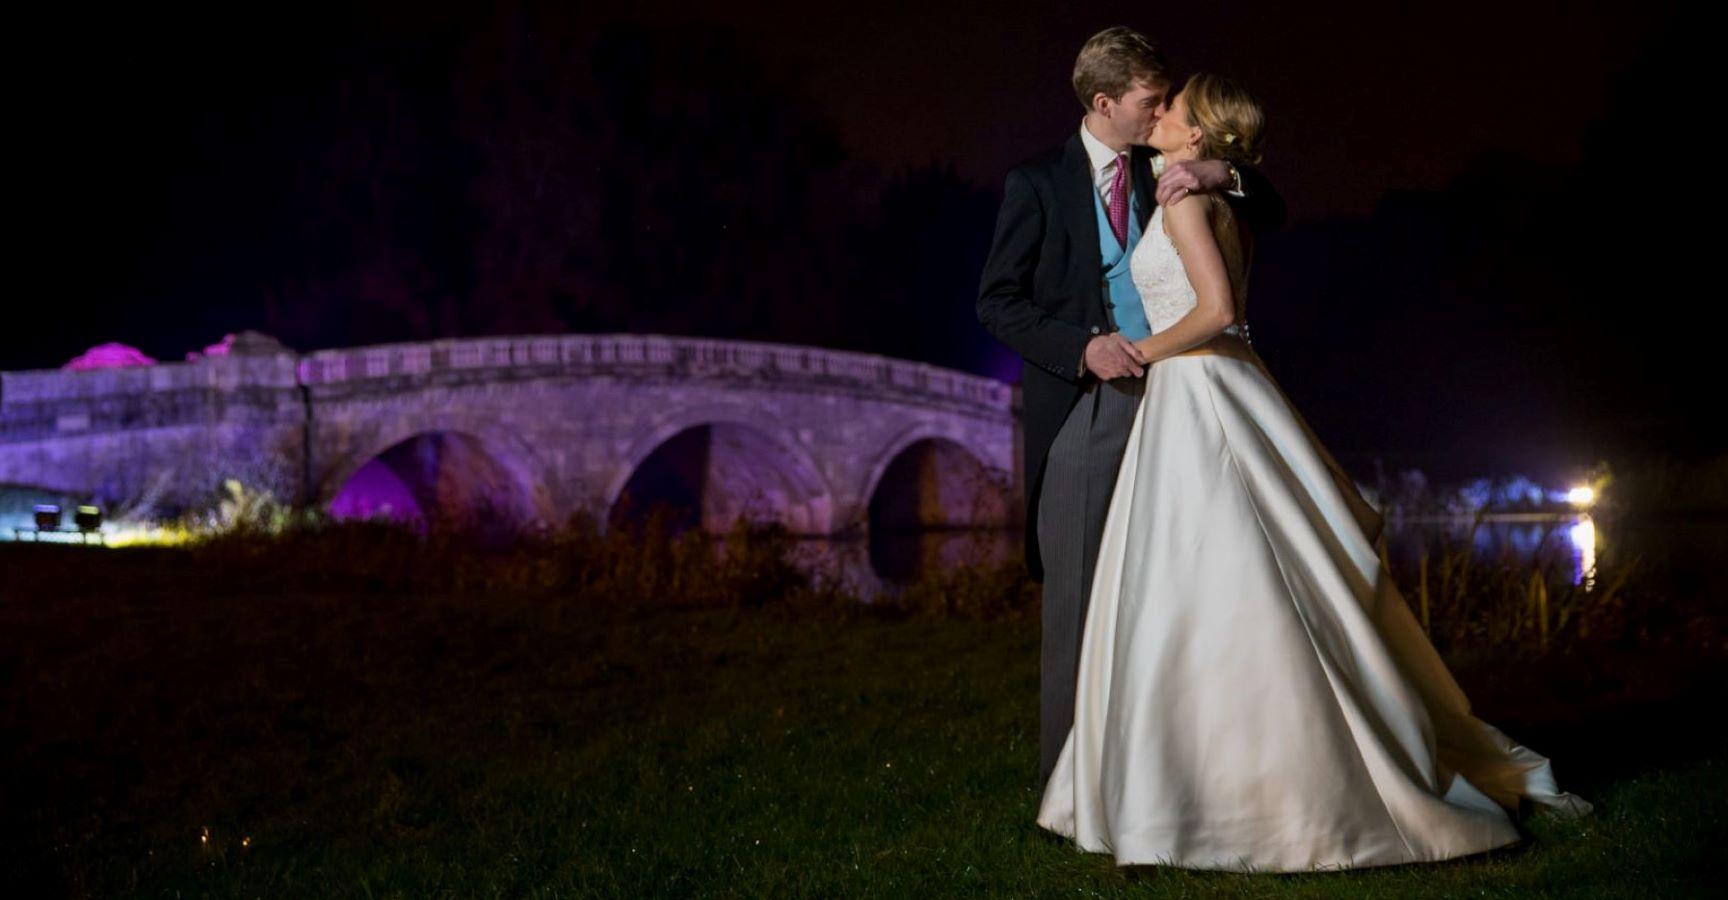 groom bride kiss beside floodlit bridge blenheim palace grounds woodstock oxfordshire wedding photography